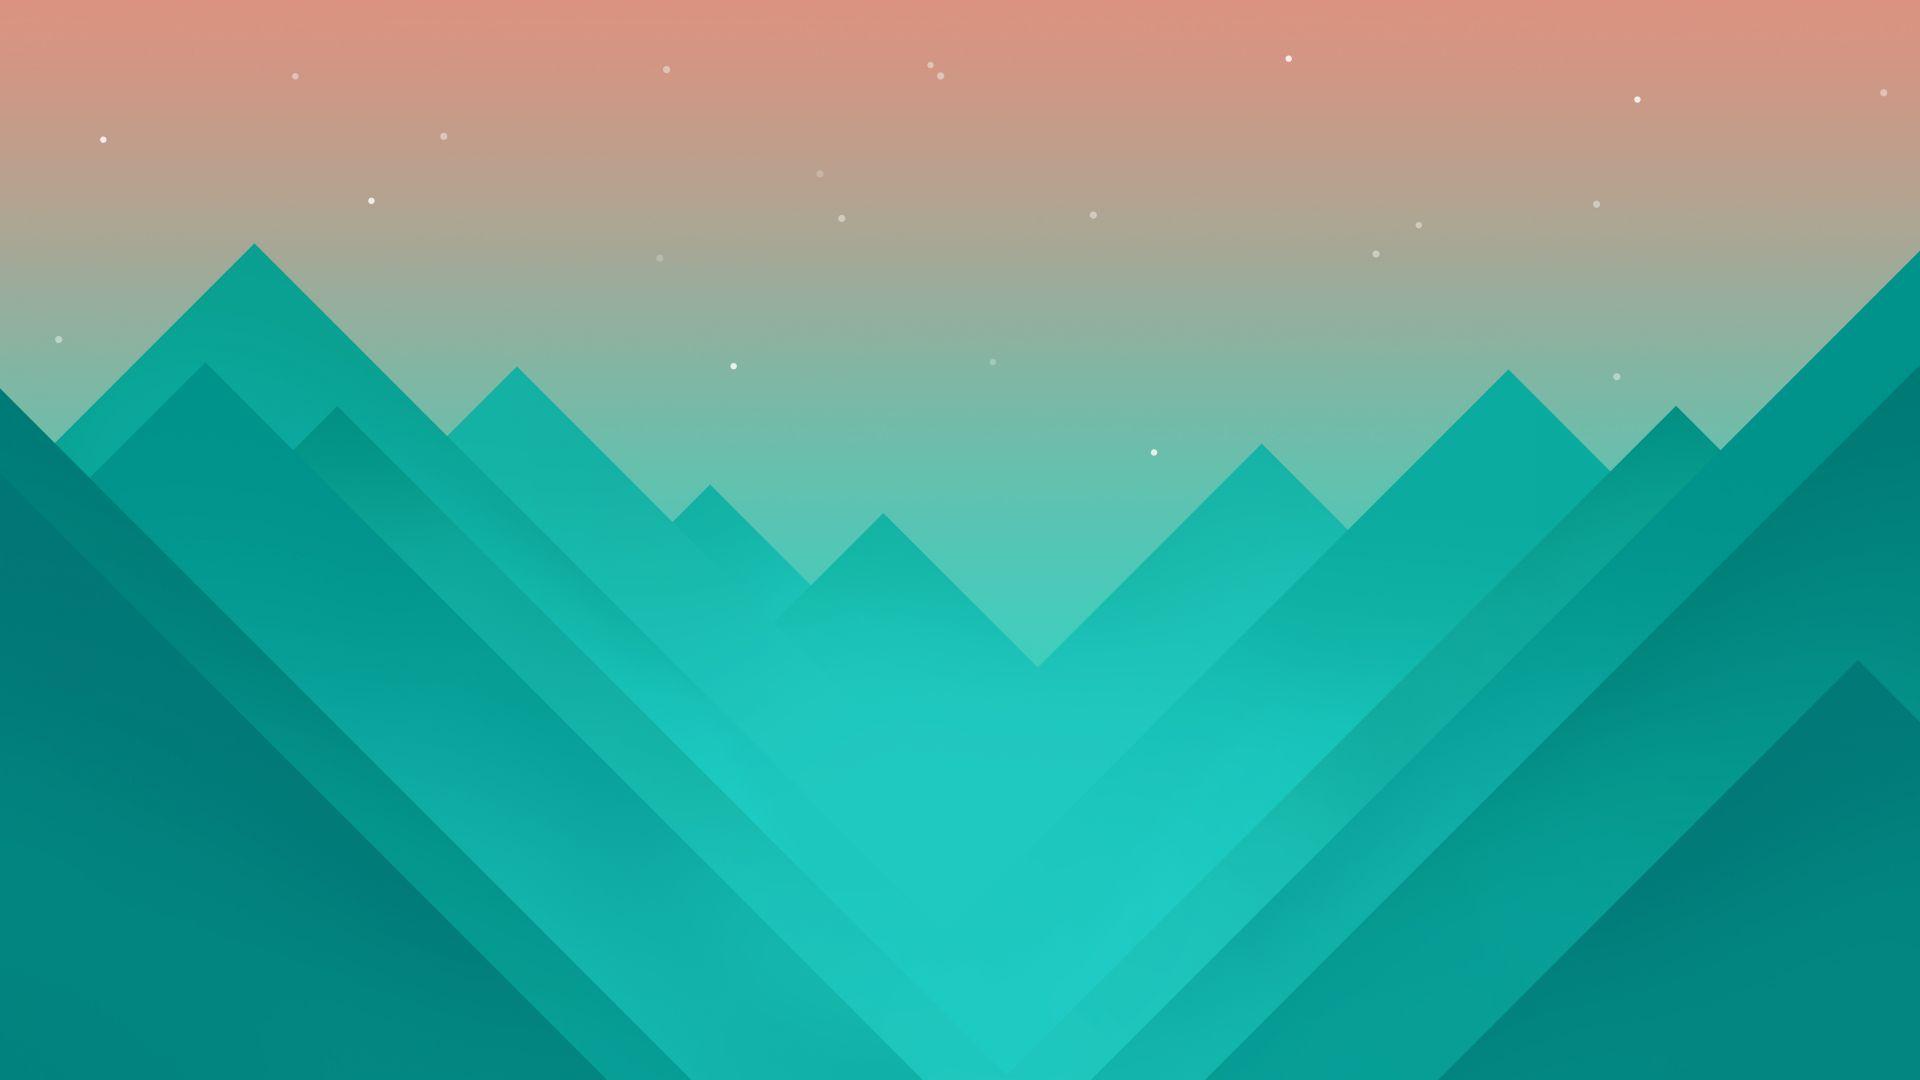 Amazing Wallpaper Mountain Polygon - 11926  Image_416452.jpg